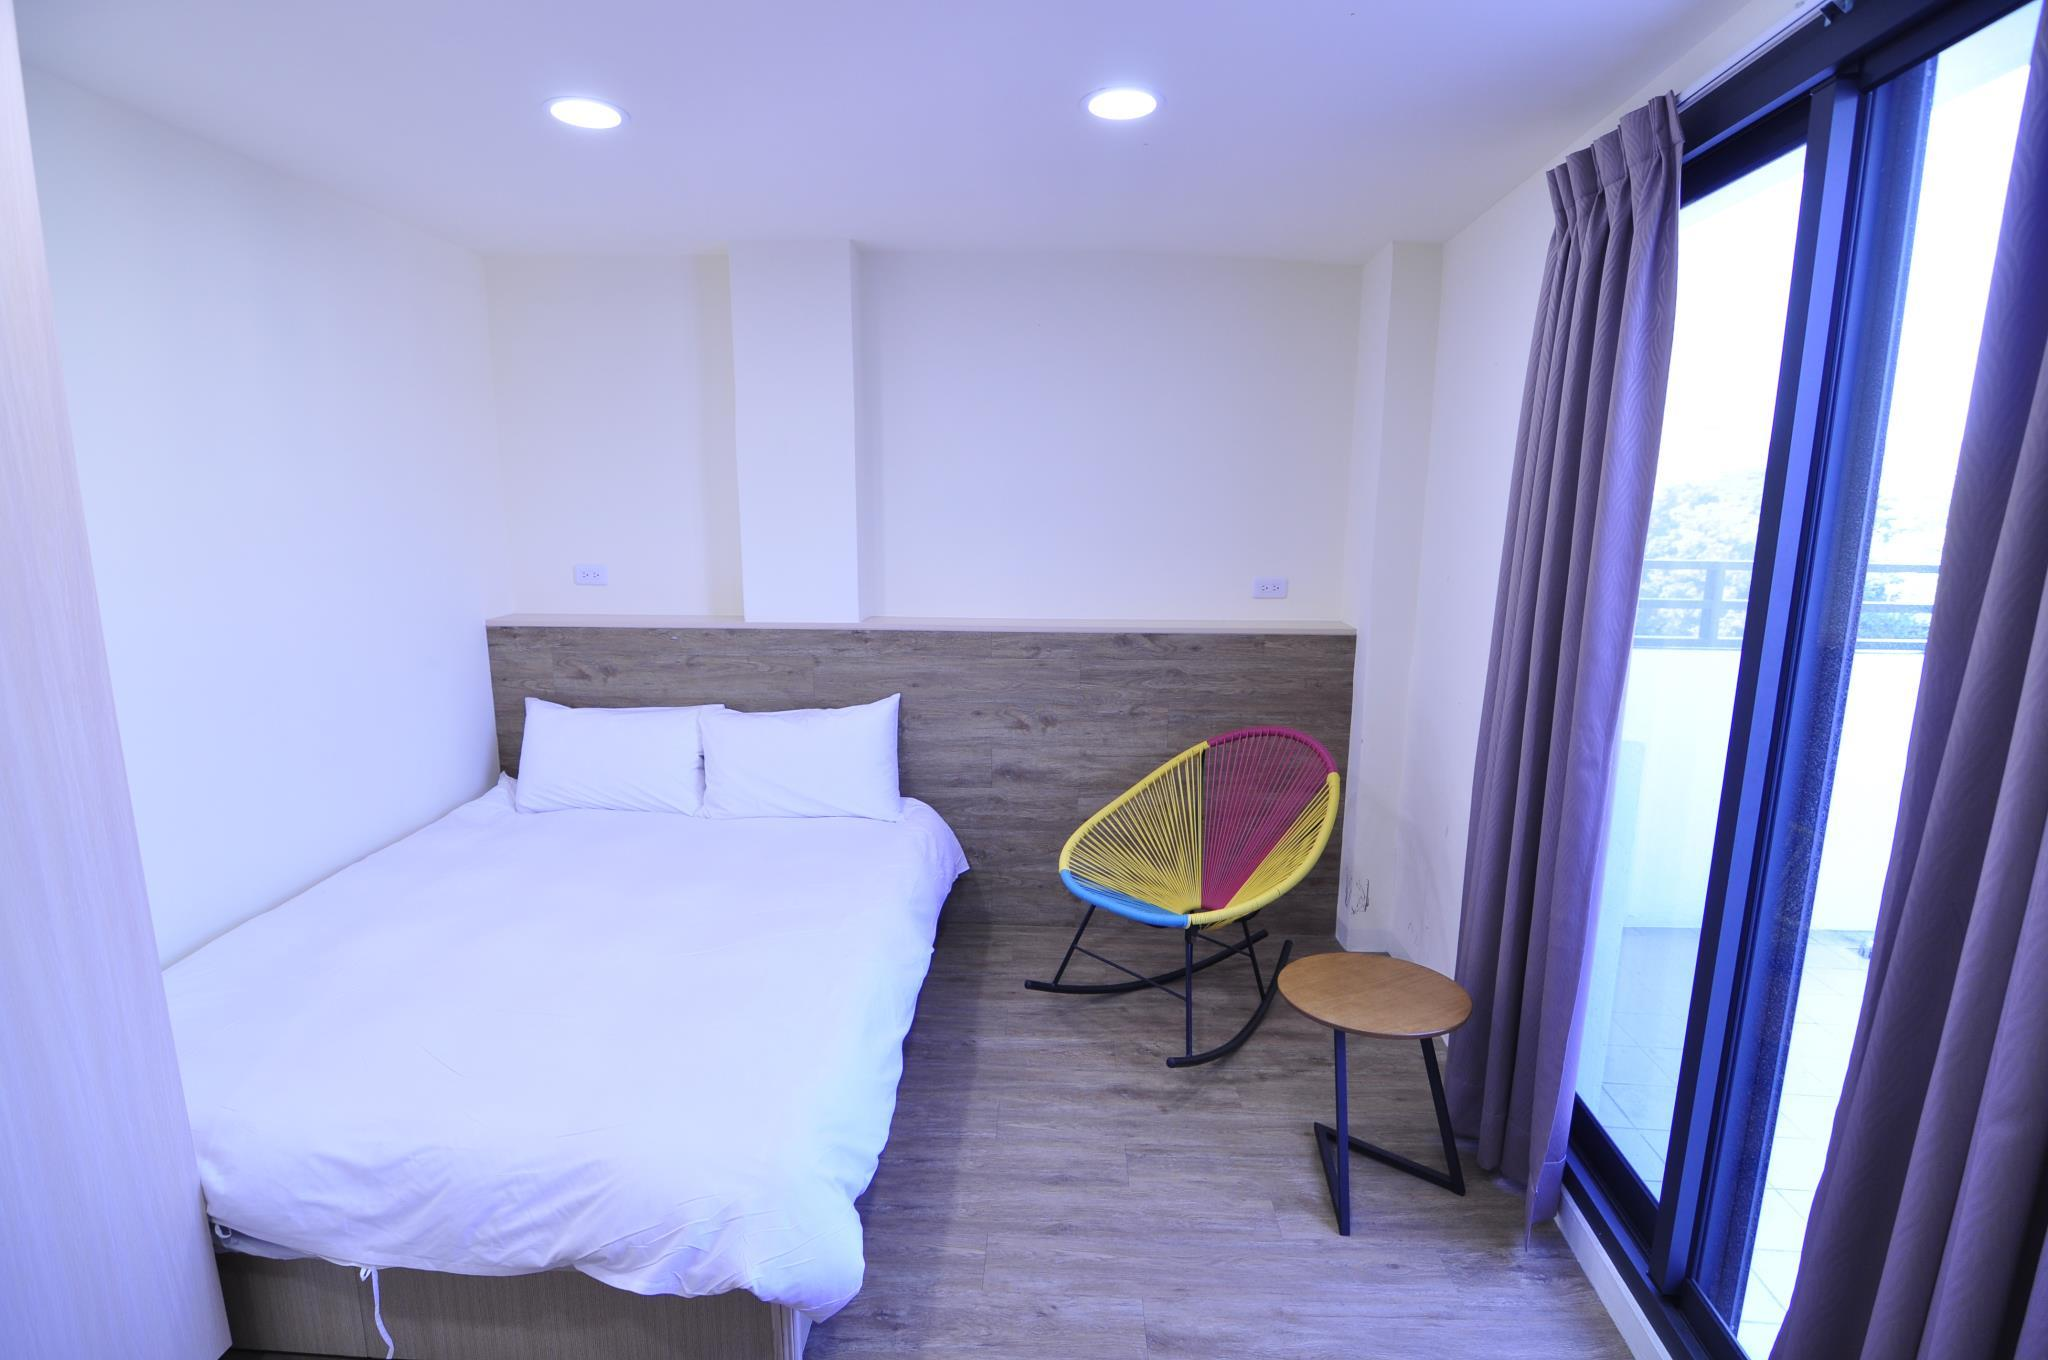 Flyinnhostel Double Room 17